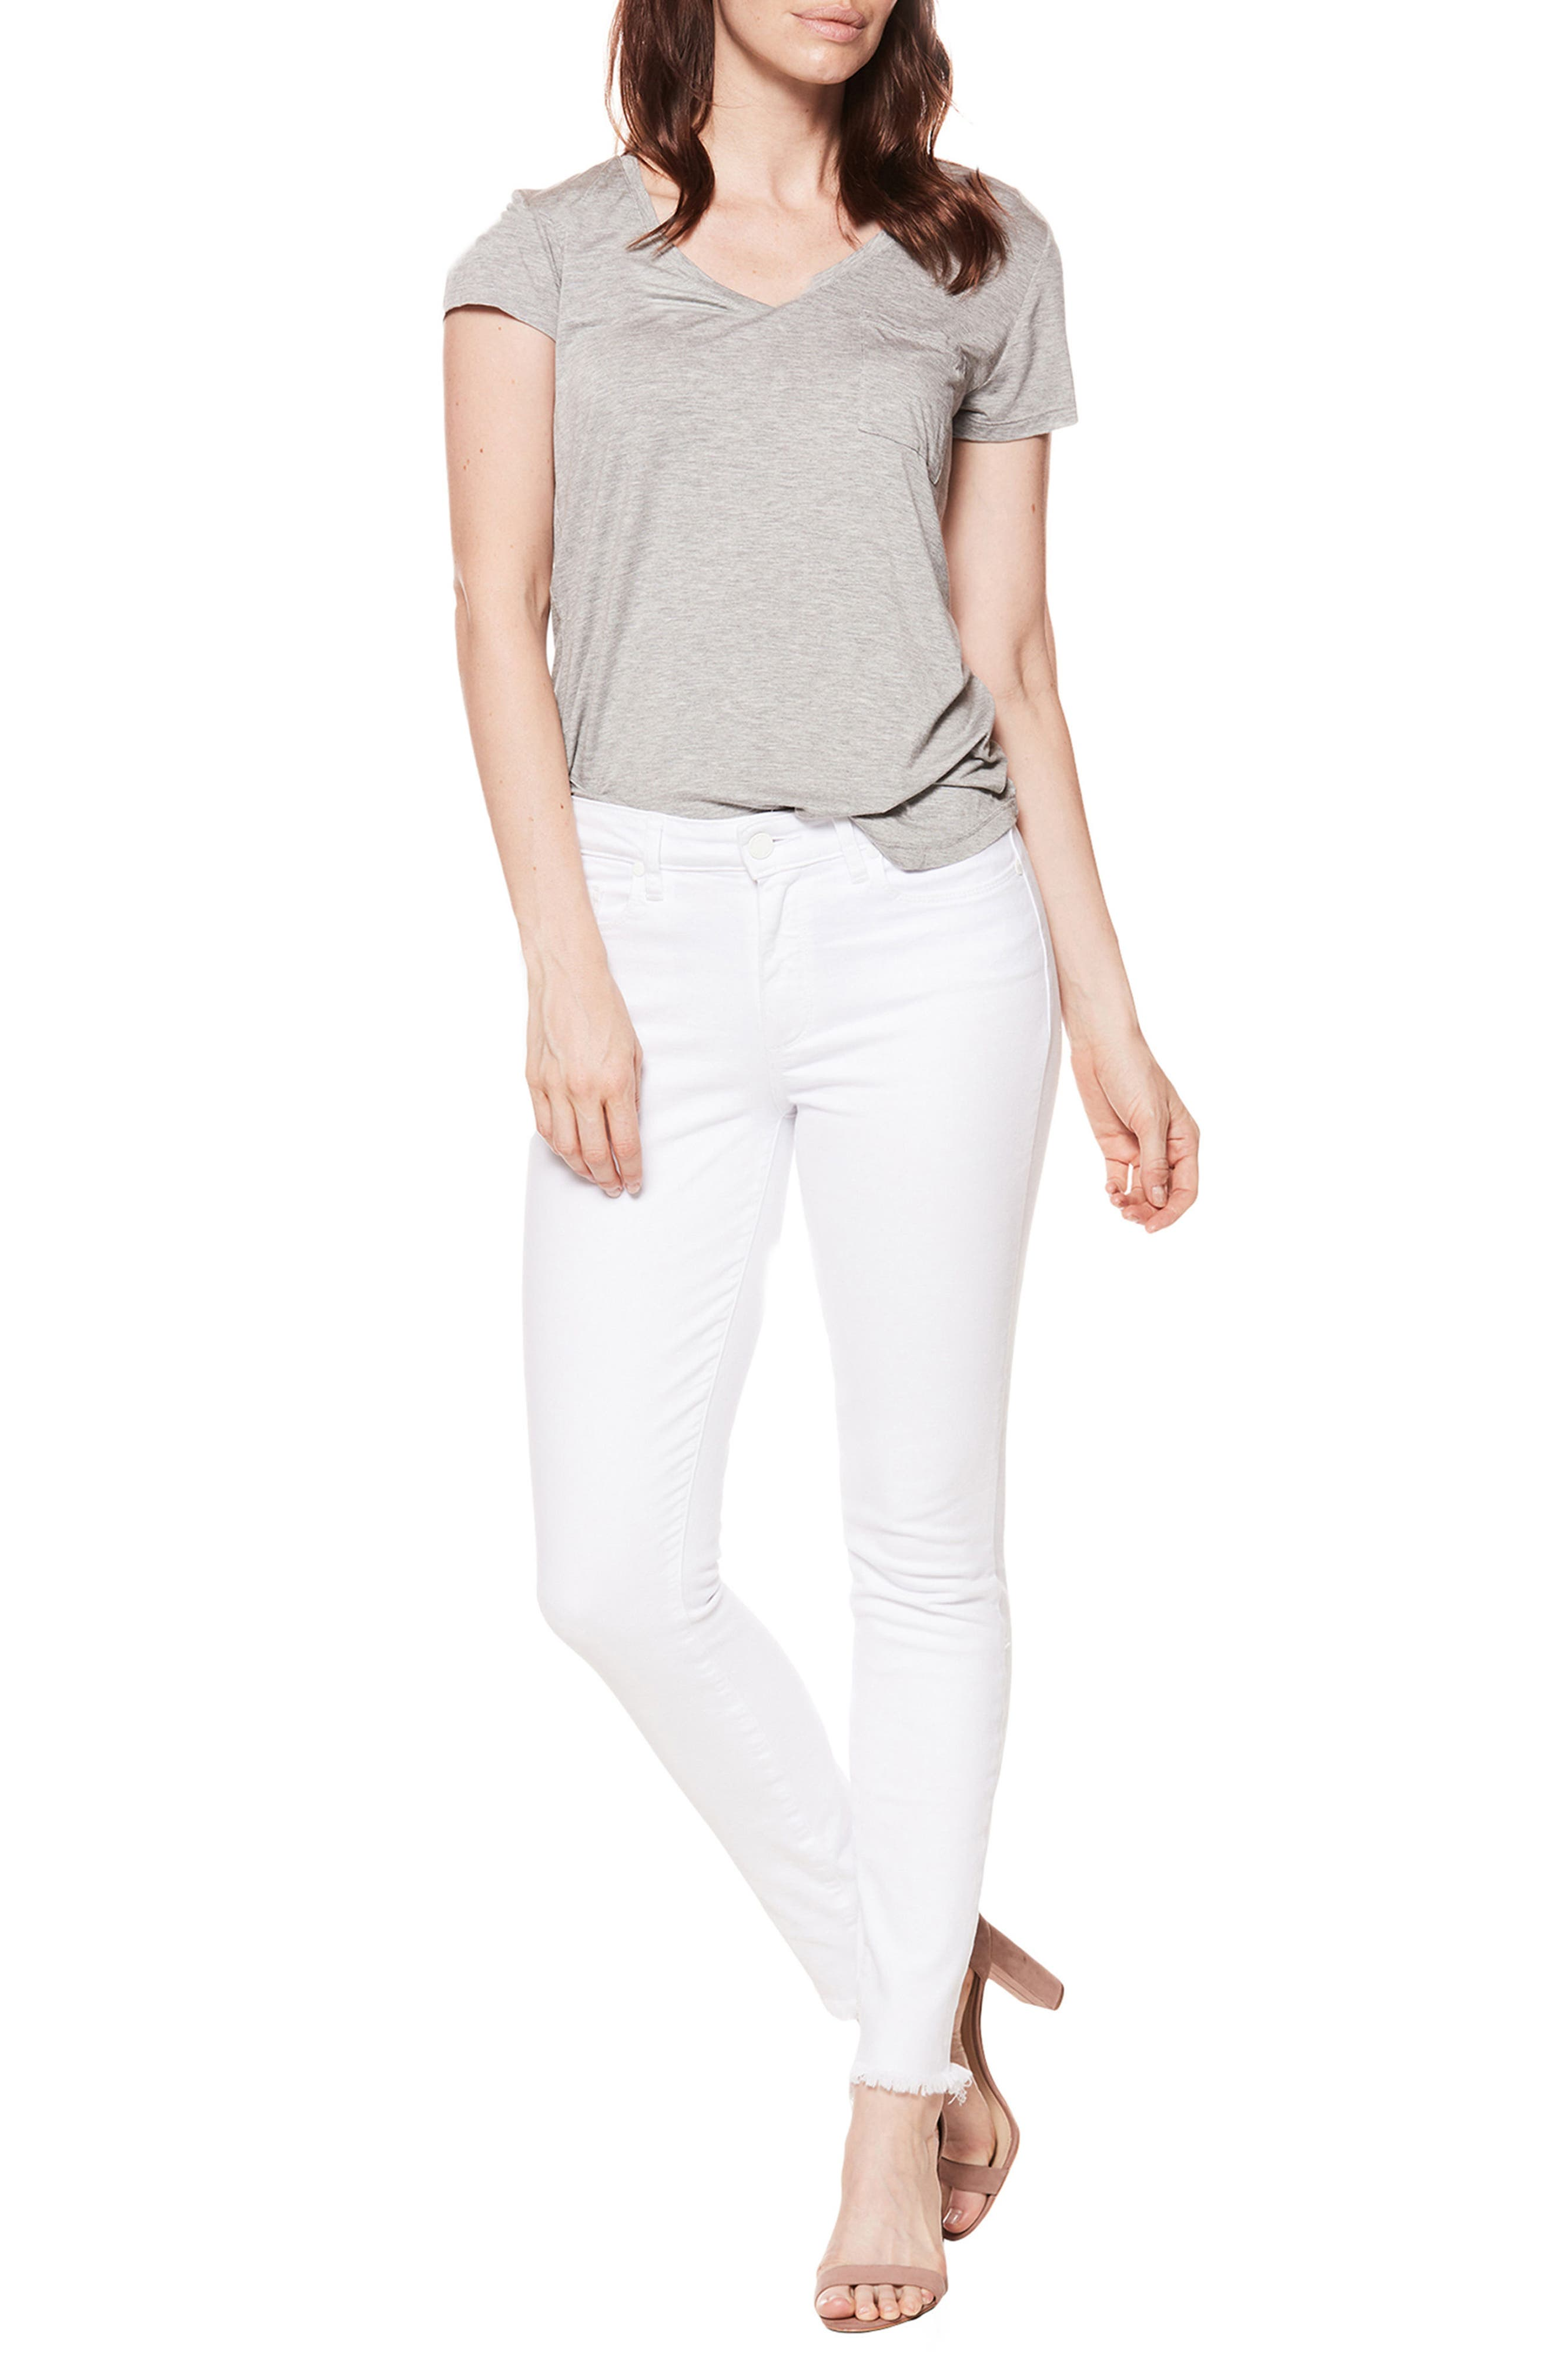 PAIGE, Hoxton High Waist Ankle Skinny Jeans, Alternate thumbnail 8, color, CRISP WHITE